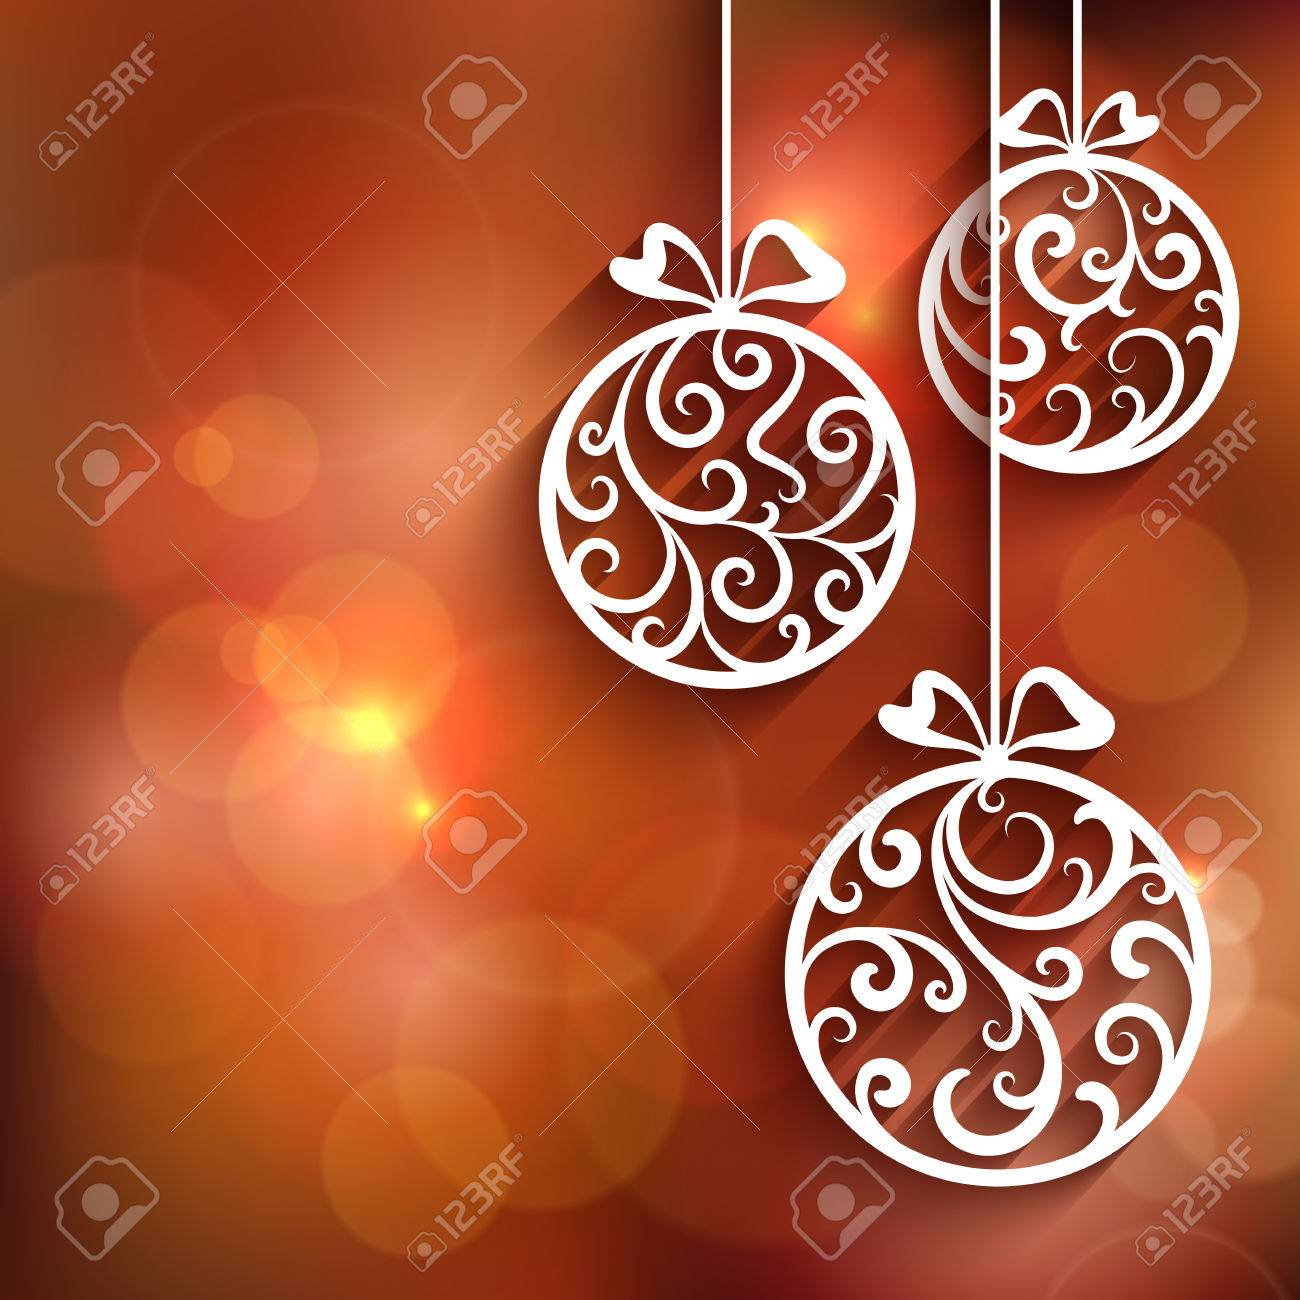 Ornamental Christmas balls with paper swirls, decorative background - 49708347